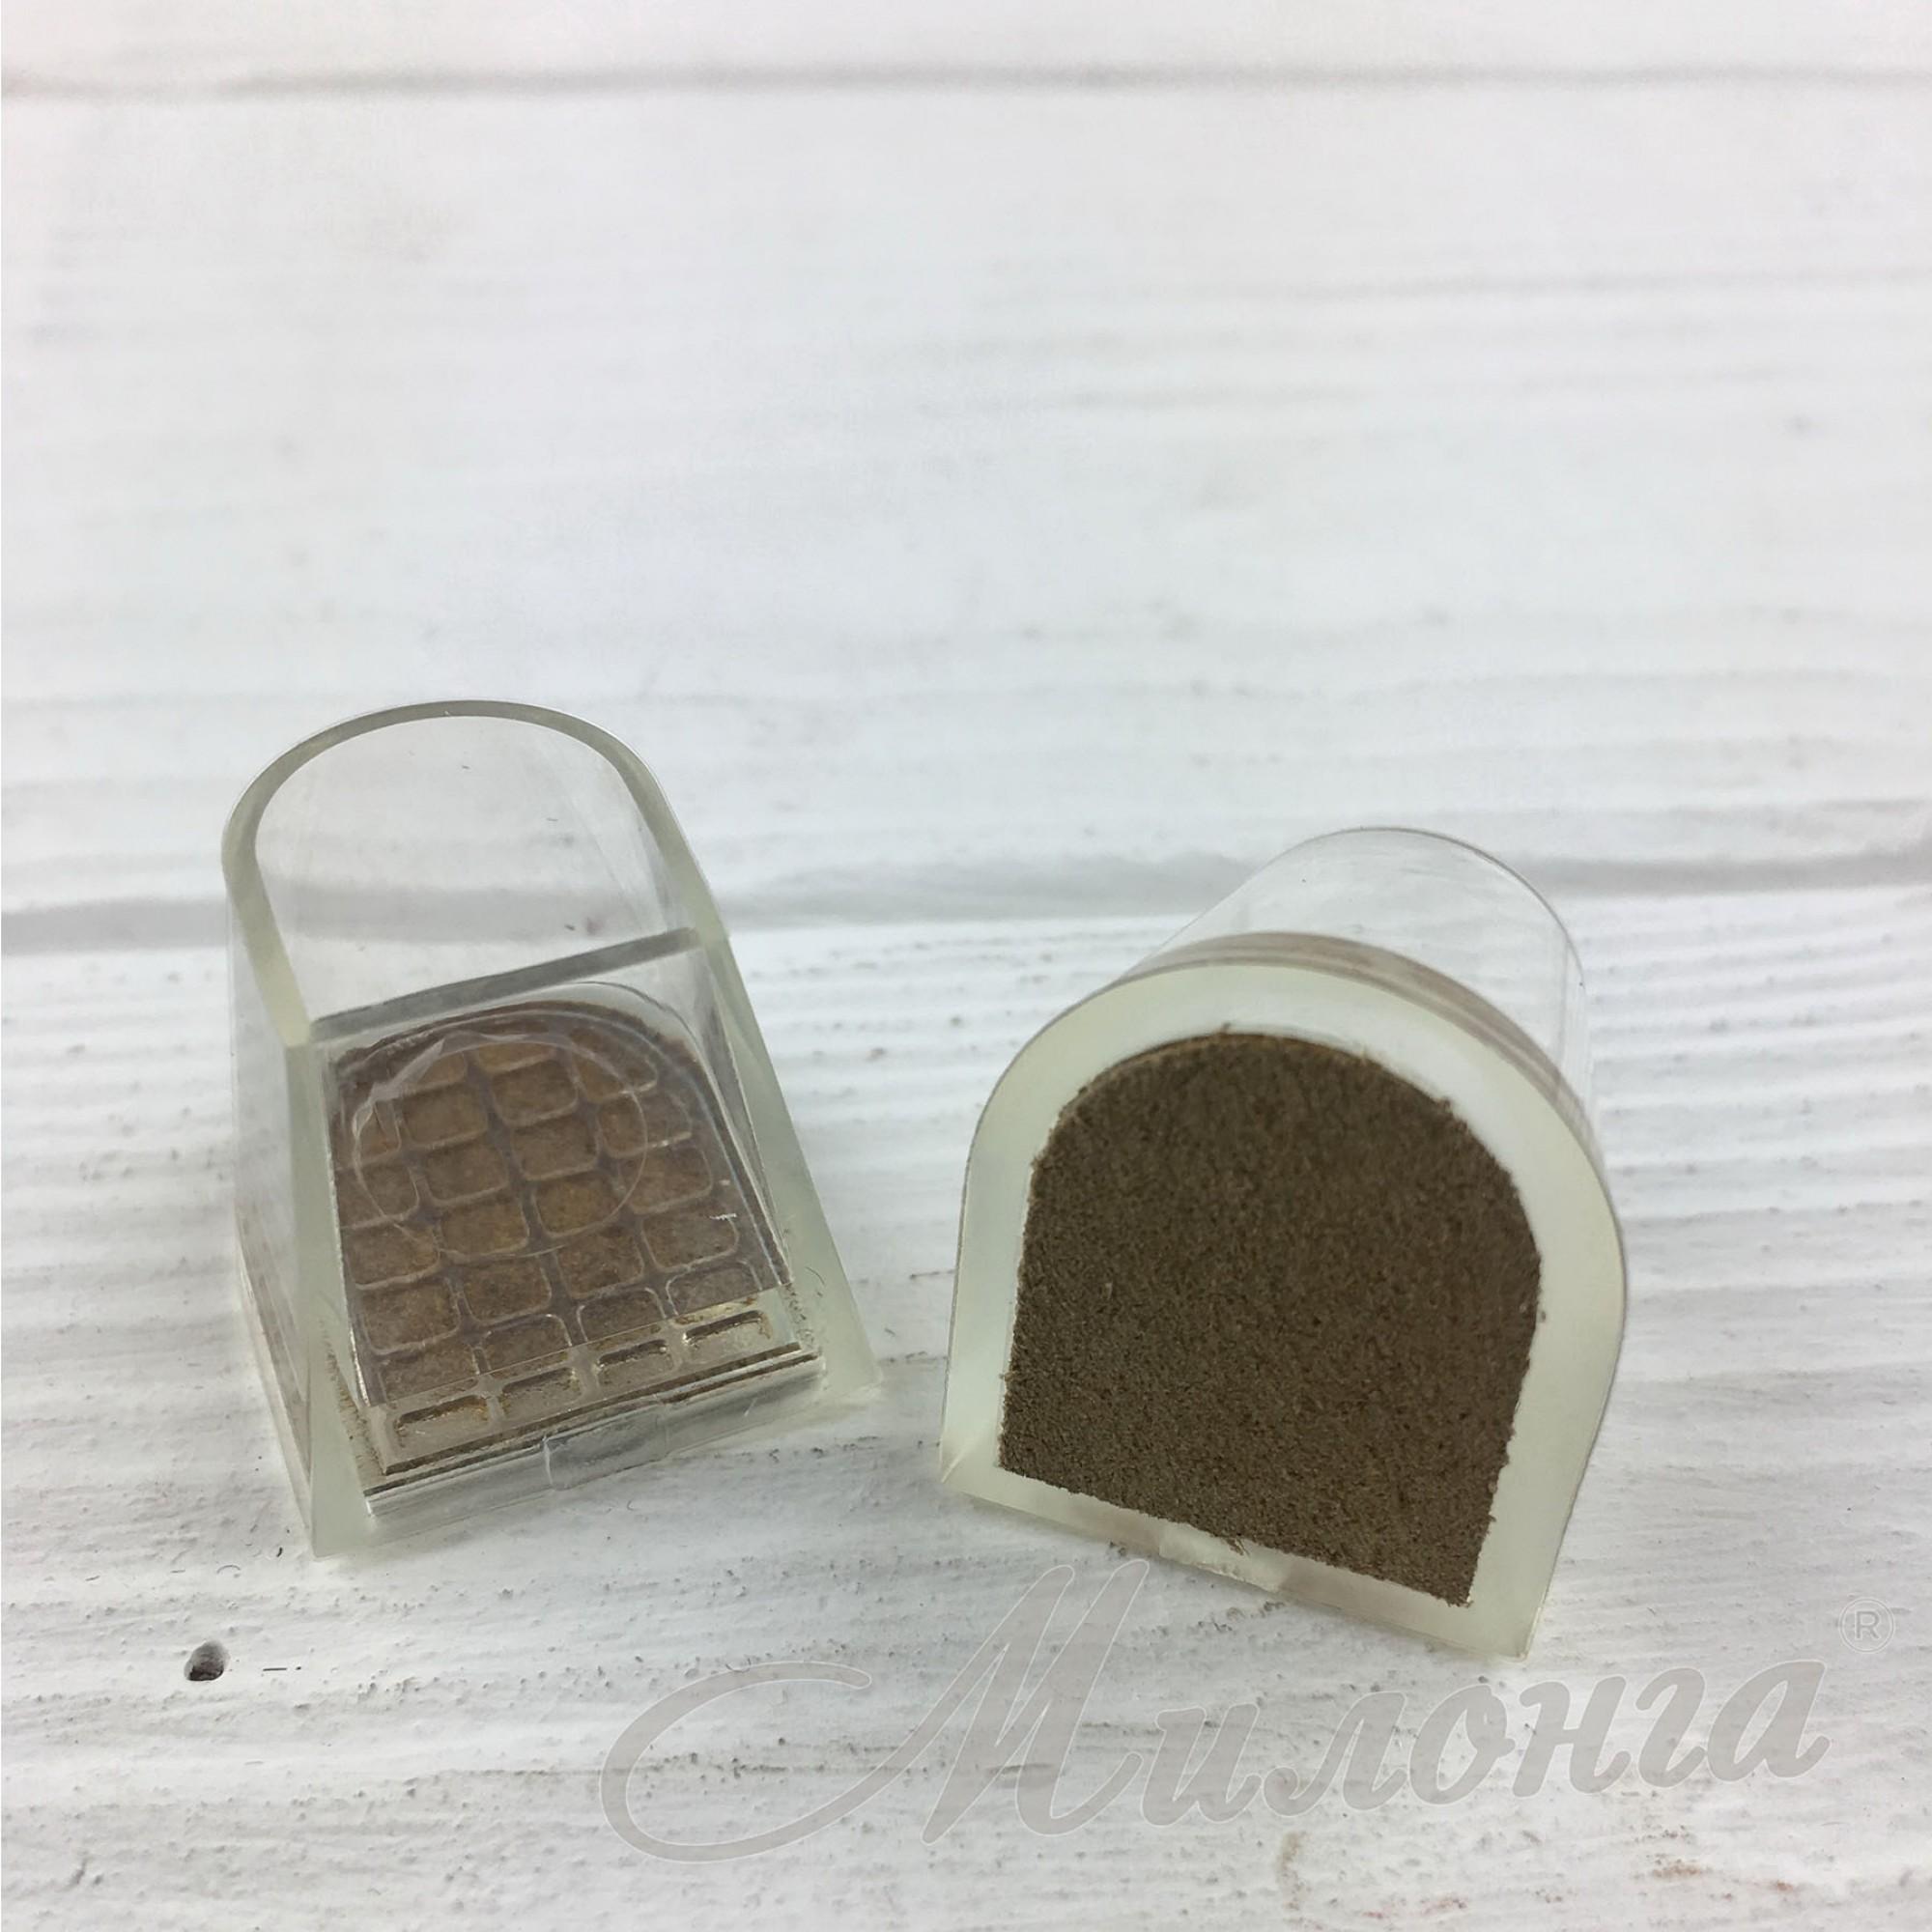 Накаблучники Flaer 2,5 (кожа)